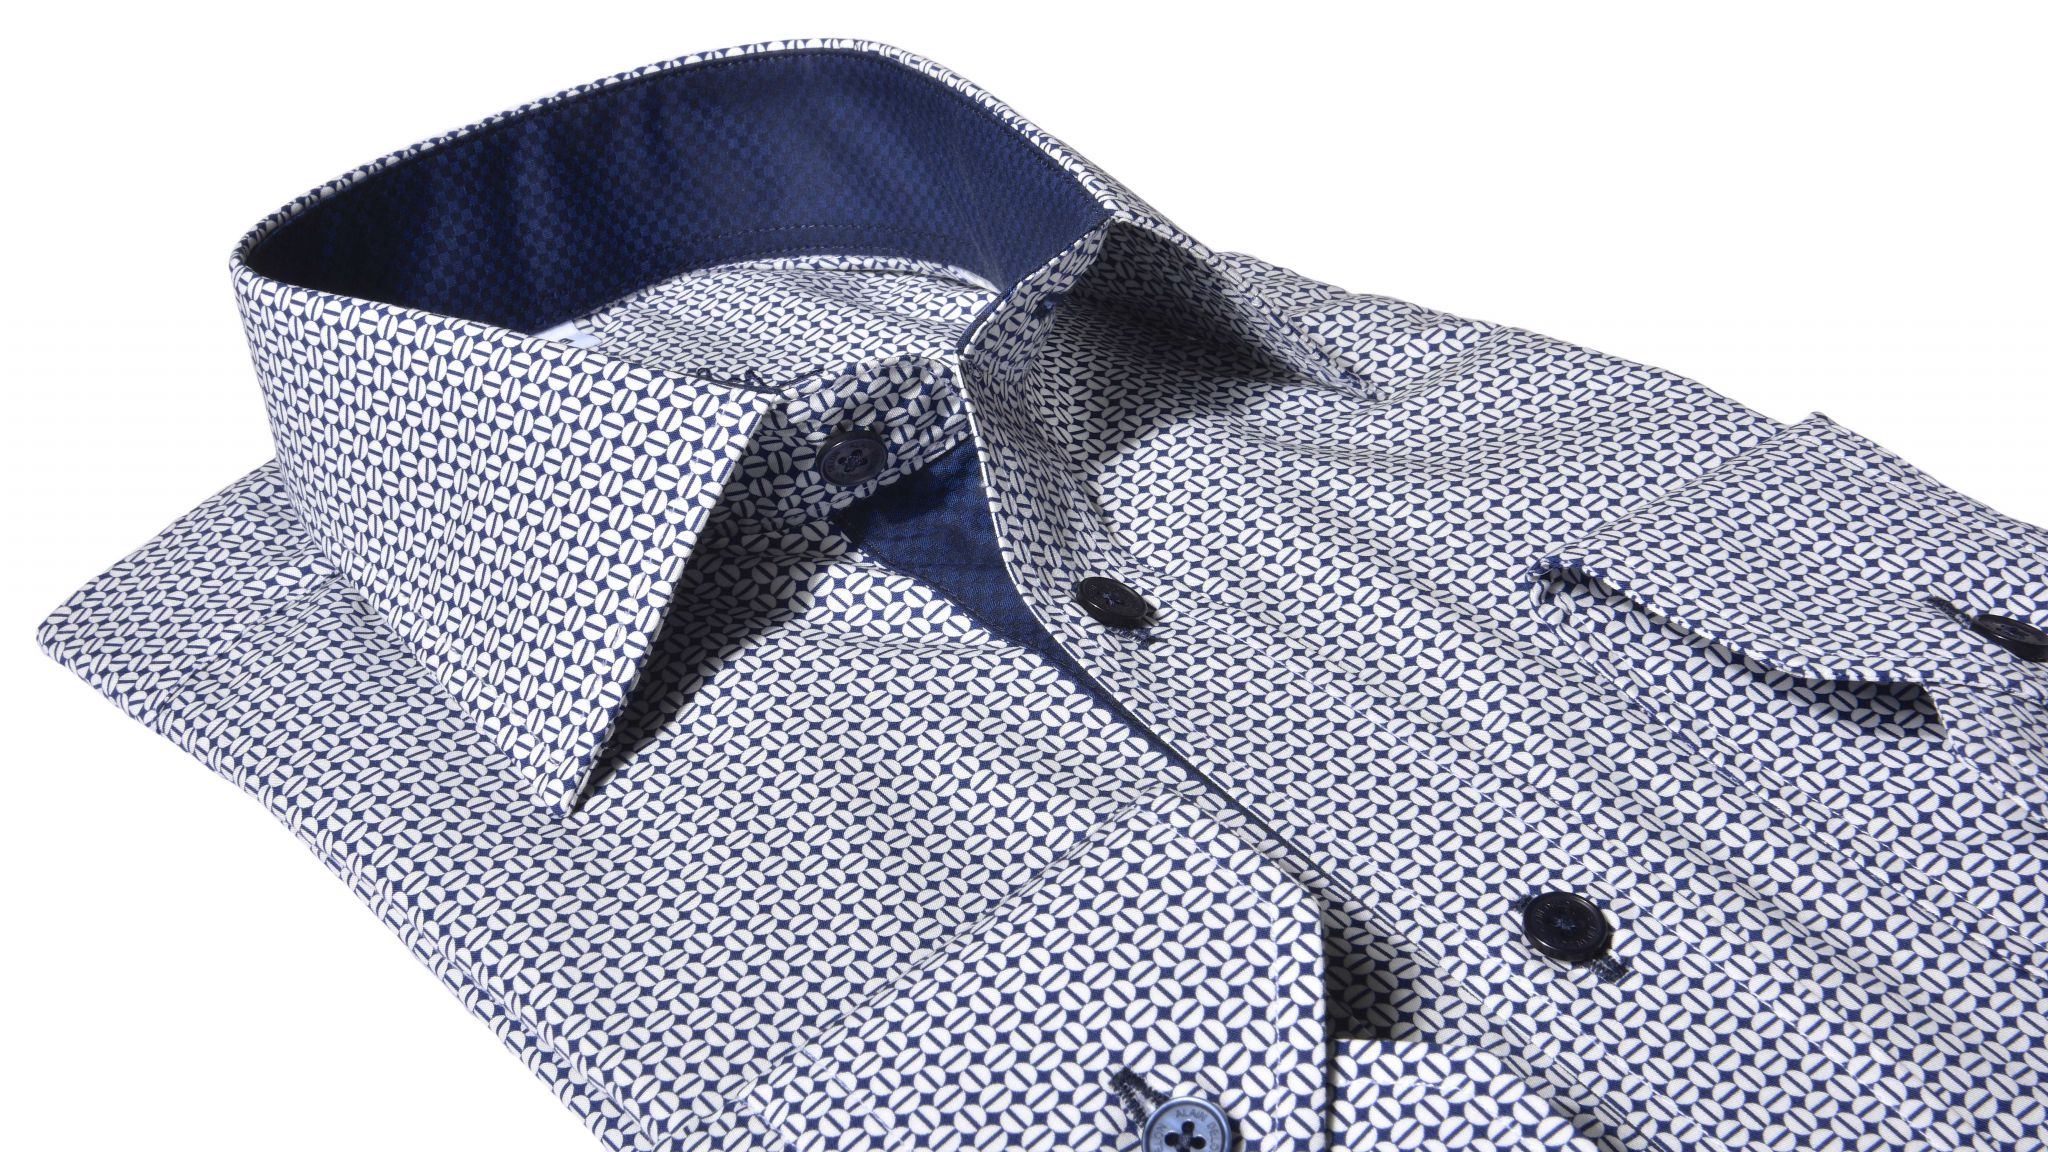 1673236cea21 Luxury Line Slim Fit košeľa s printom - Košele - E-shop